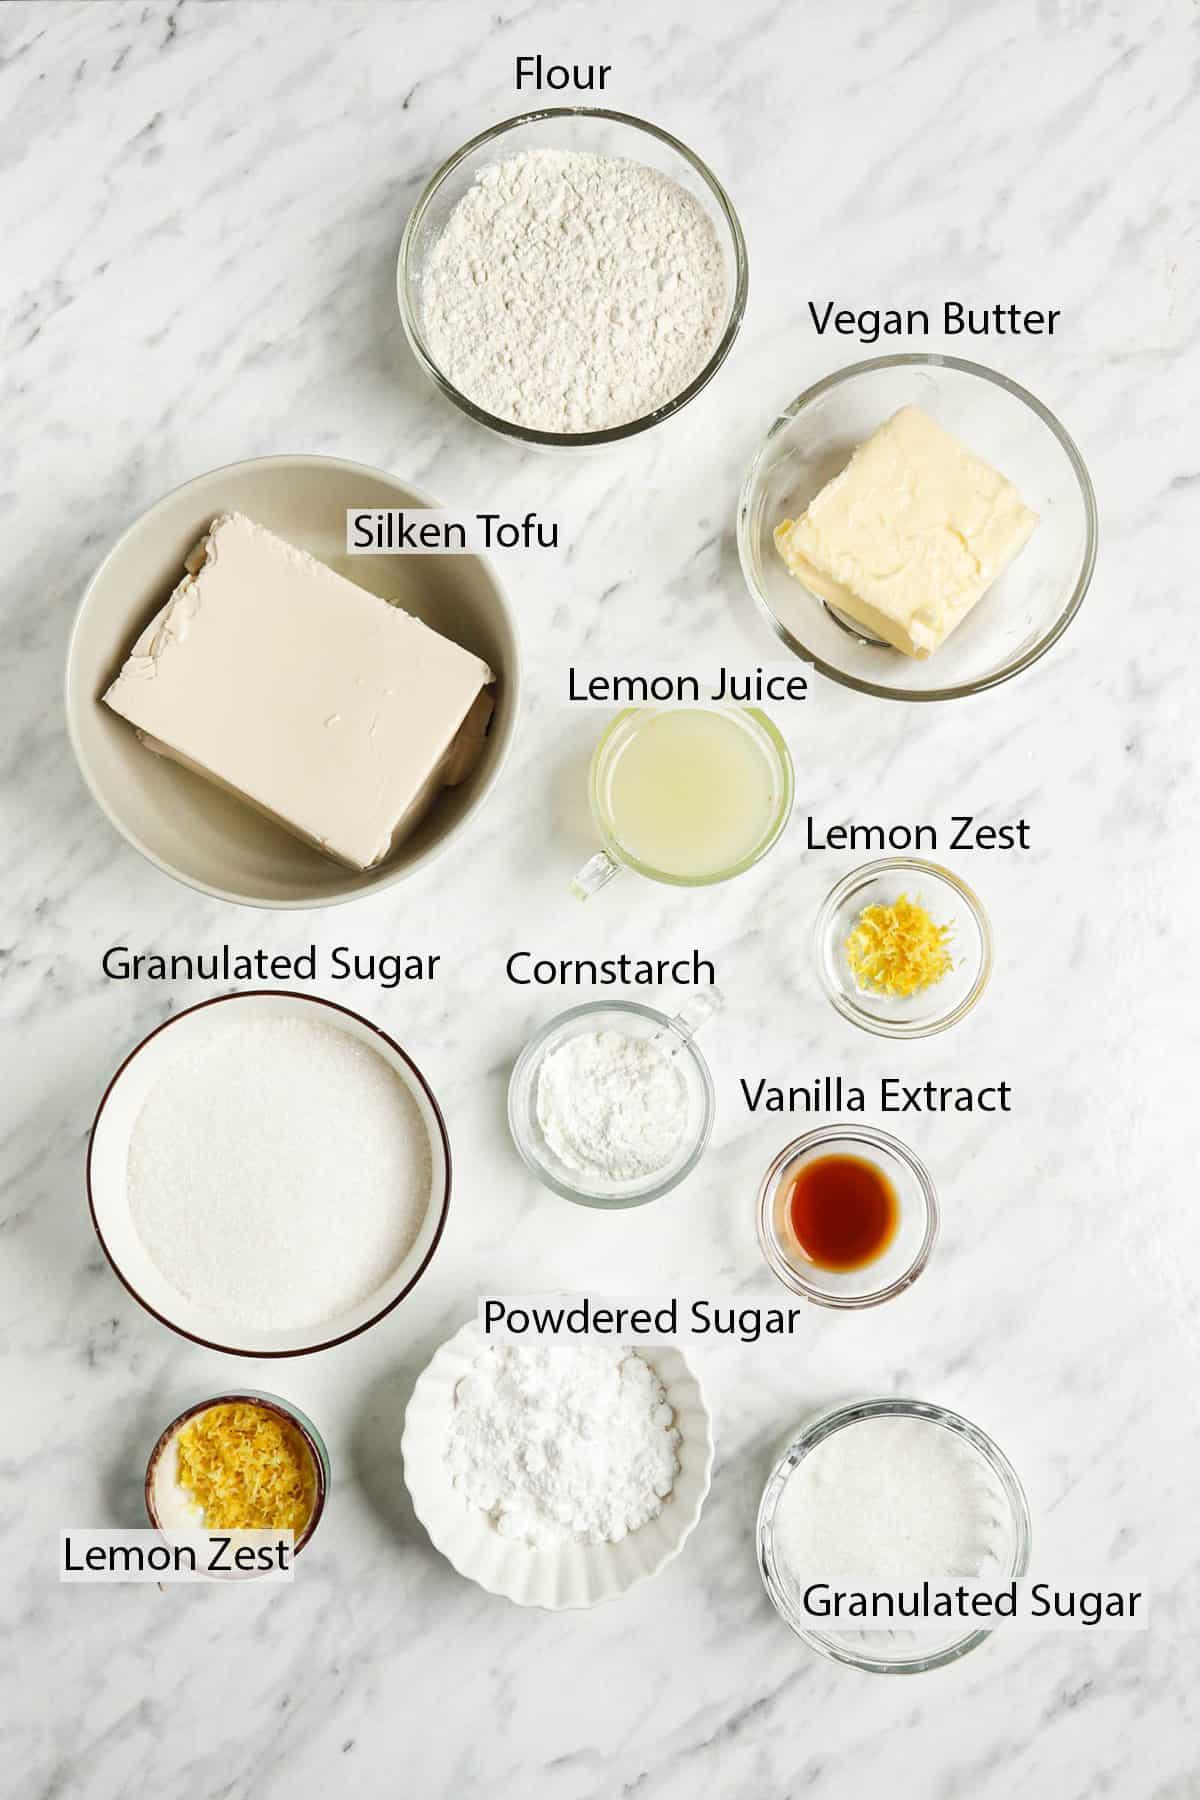 sugar, lemon juice and zest, vanilla, flour, cornstarch, tofu, vegan butter on white surface